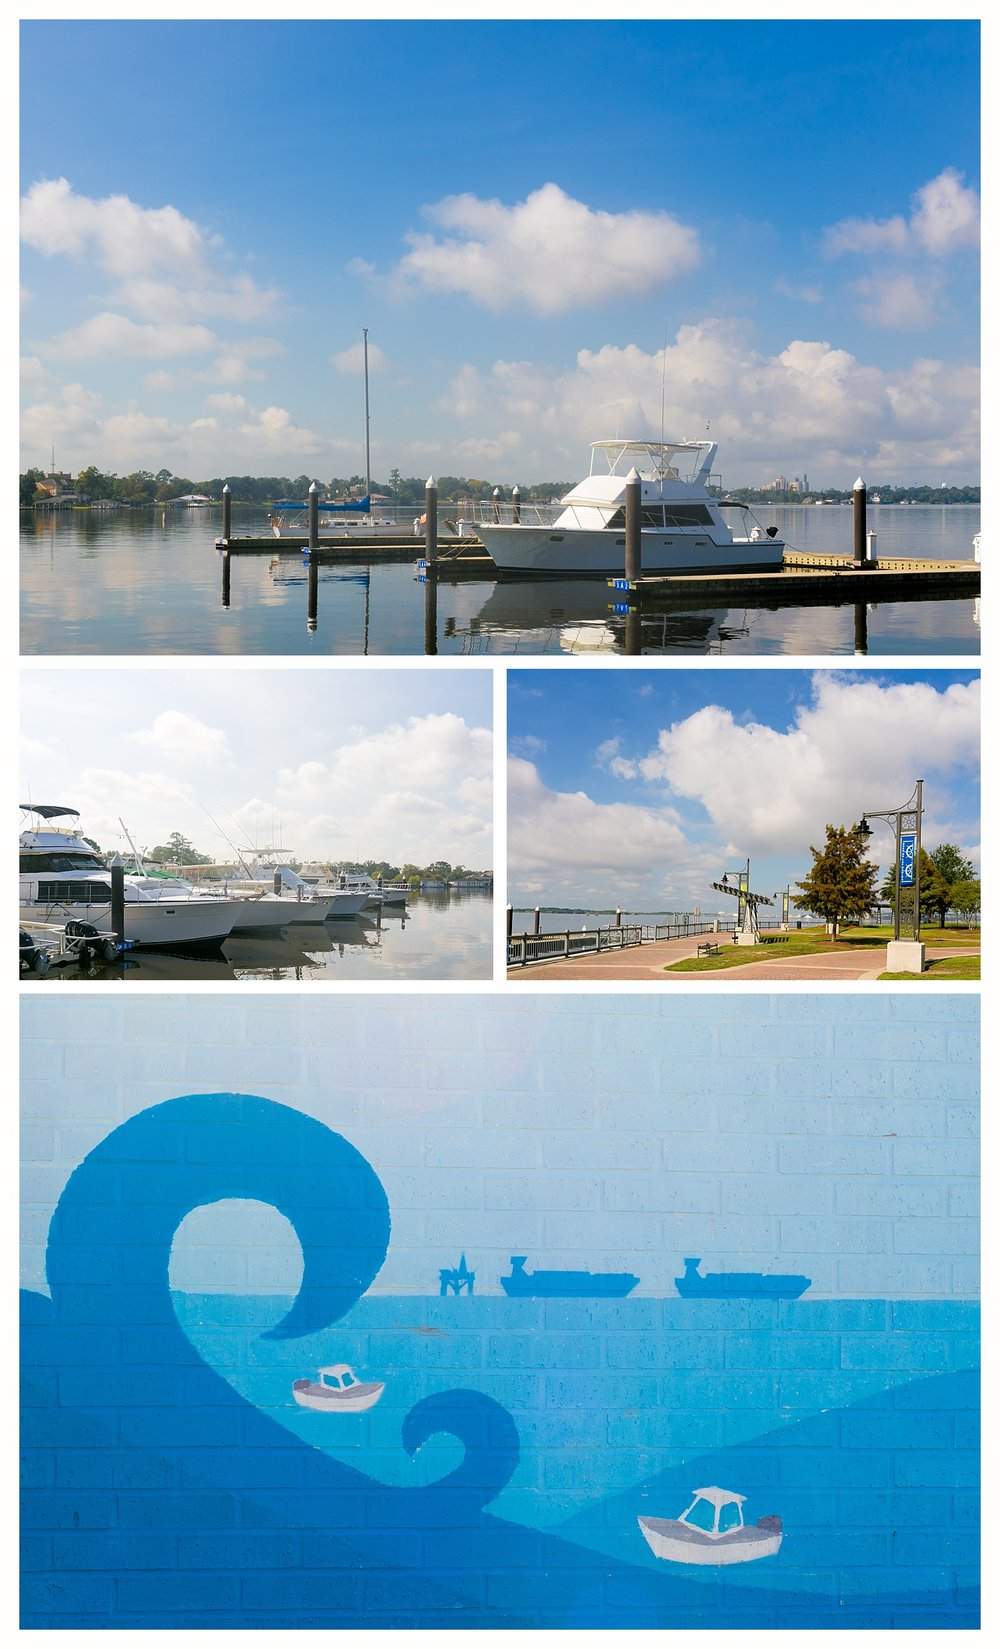 boats in harbor in Lake Charles, Louisiana